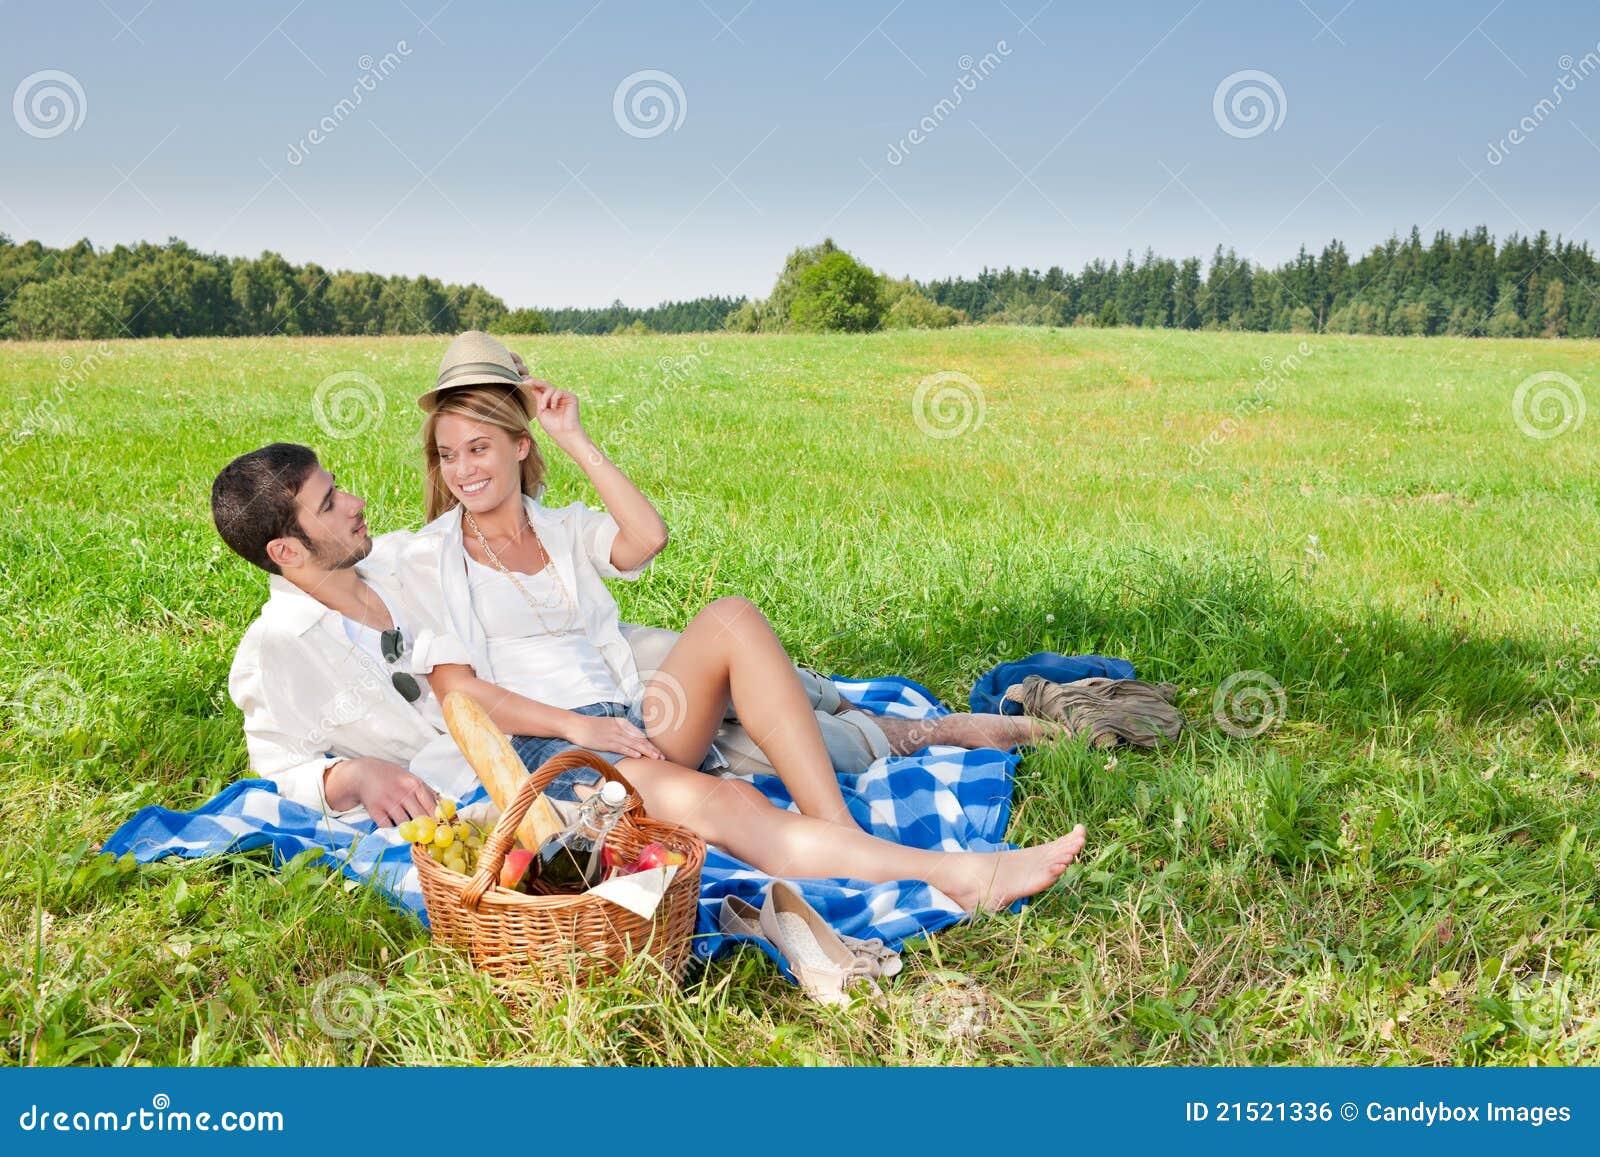 couple romantique fellations natures